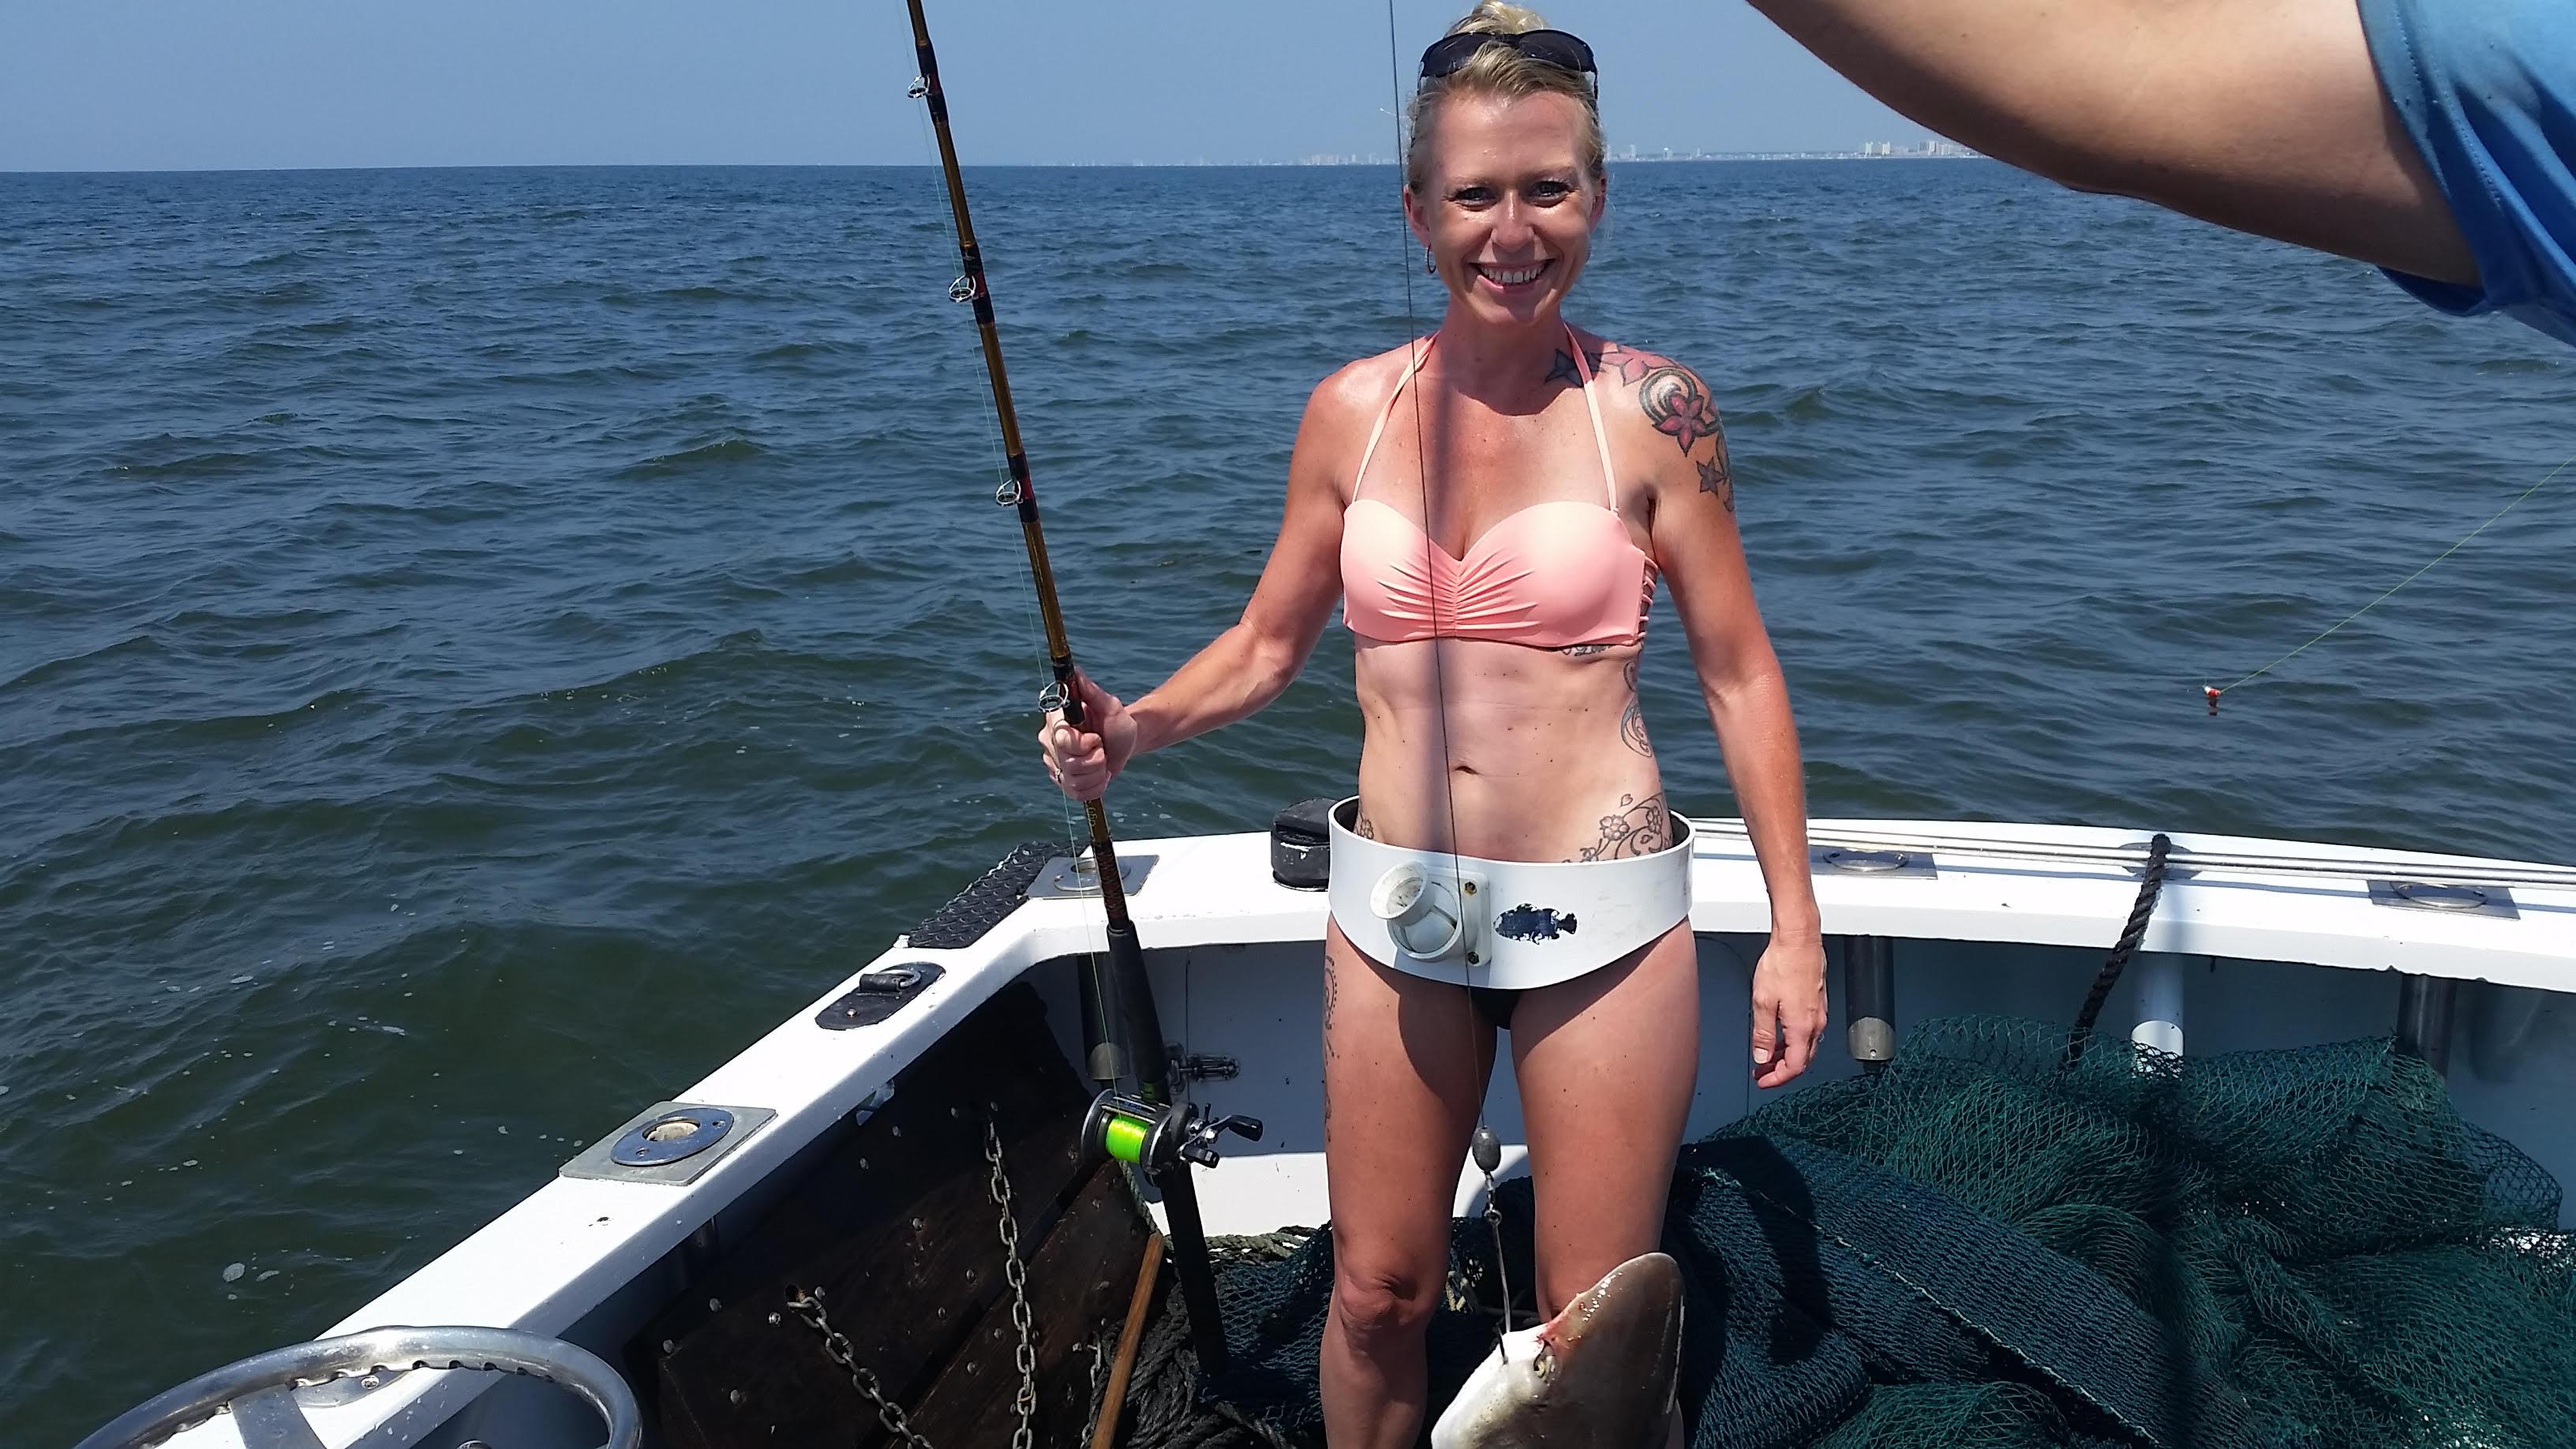 Fisherman on myrtle fishing trip